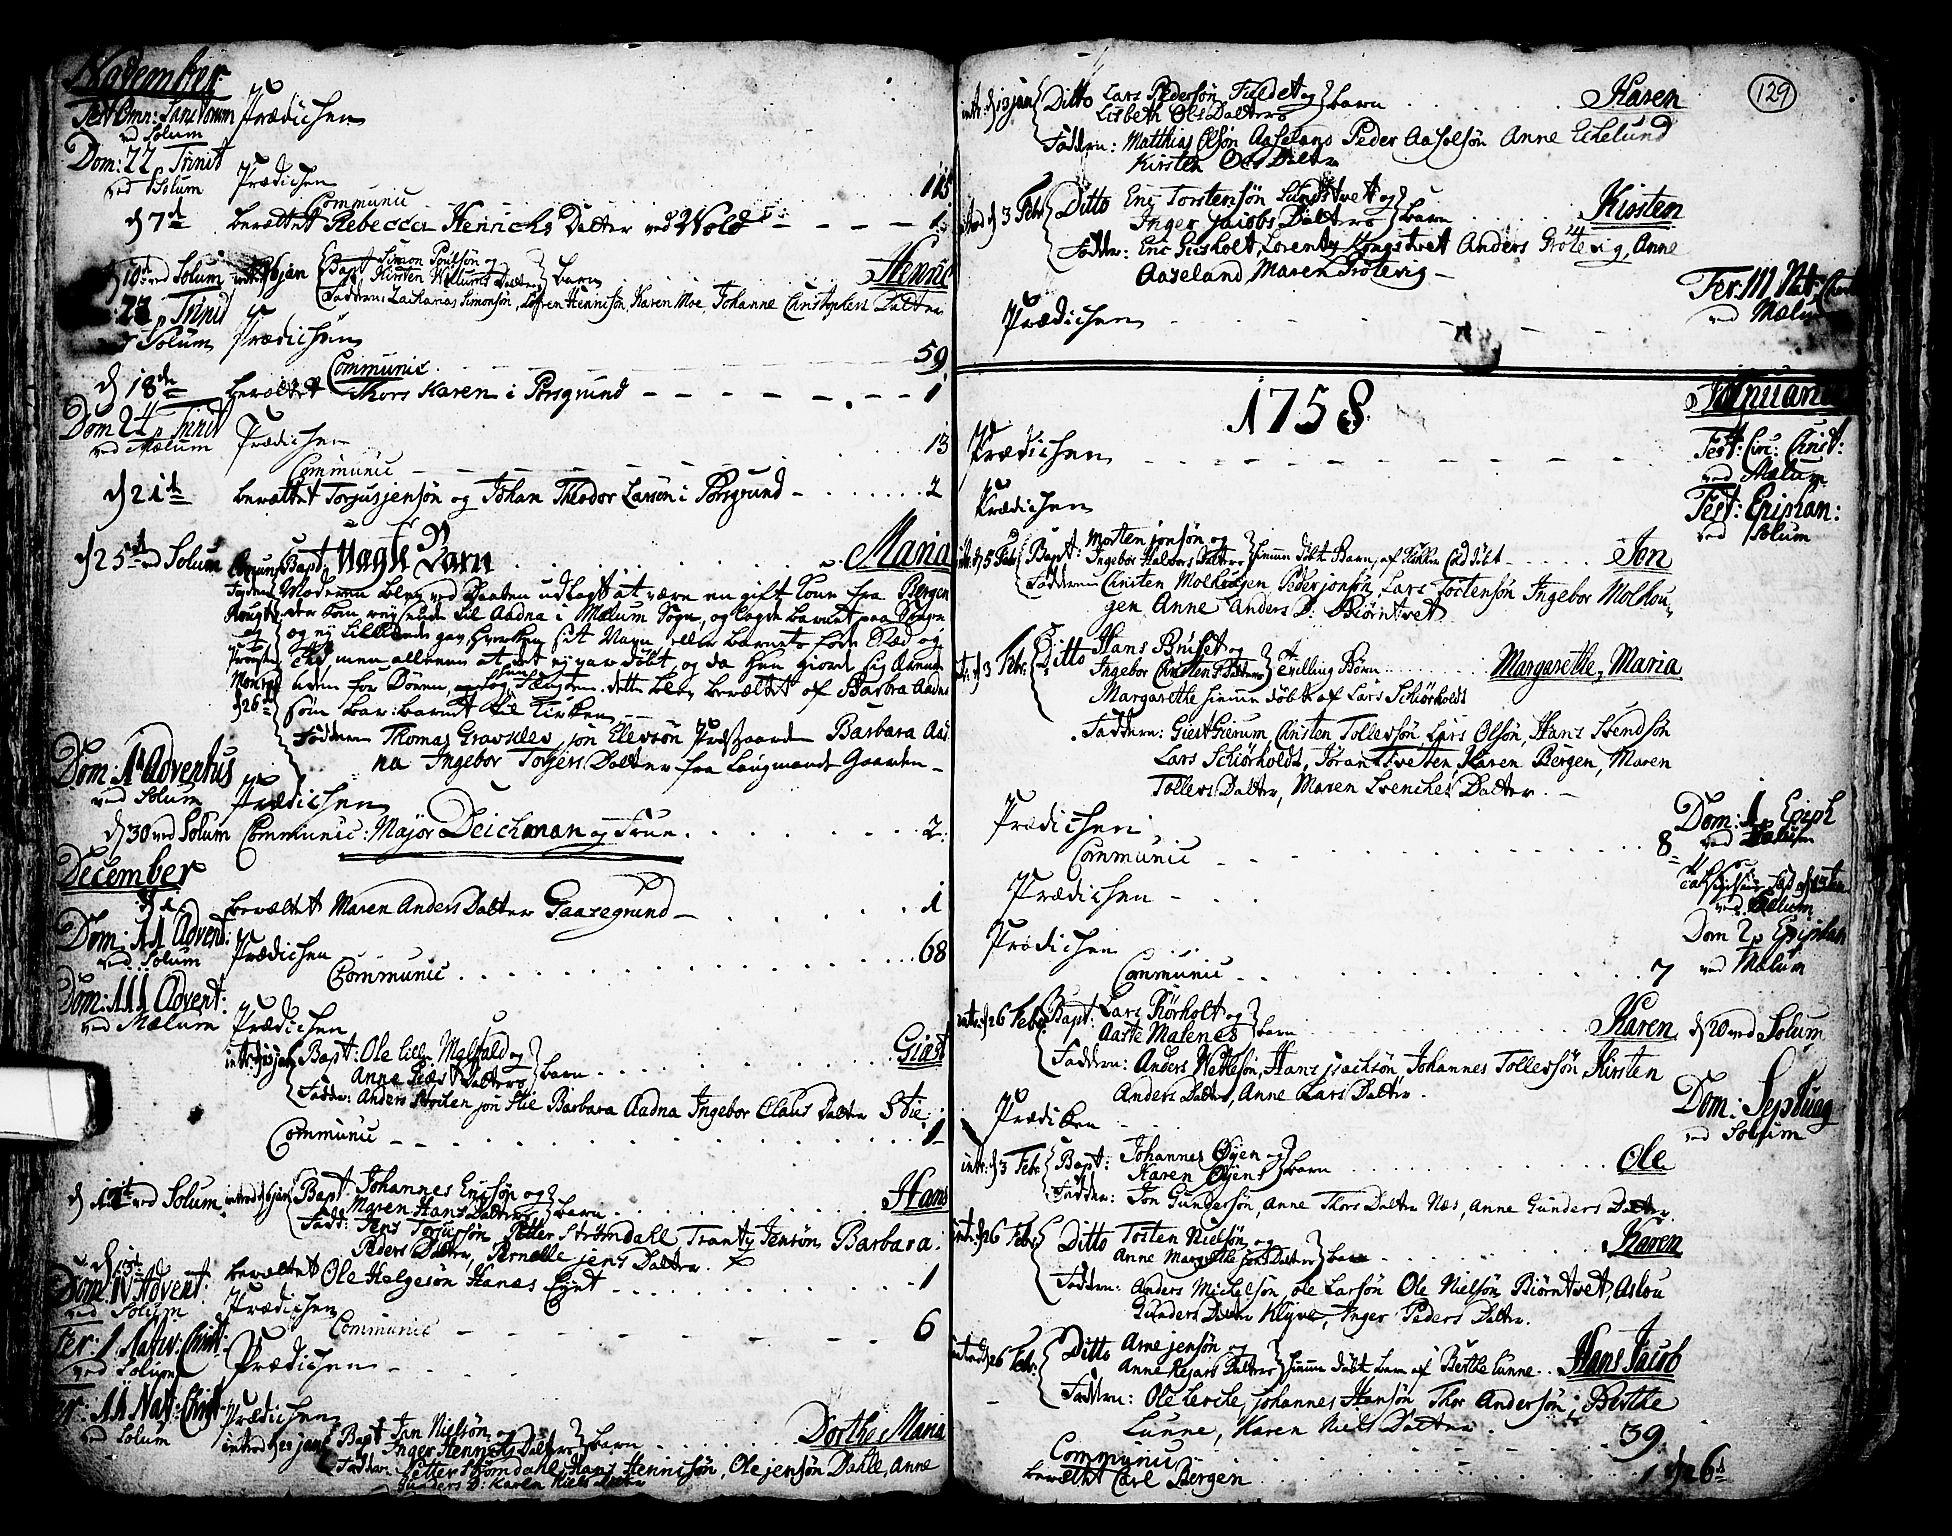 SAKO, Solum kirkebøker, F/Fa/L0002: Ministerialbok nr. I 2, 1713-1761, s. 129